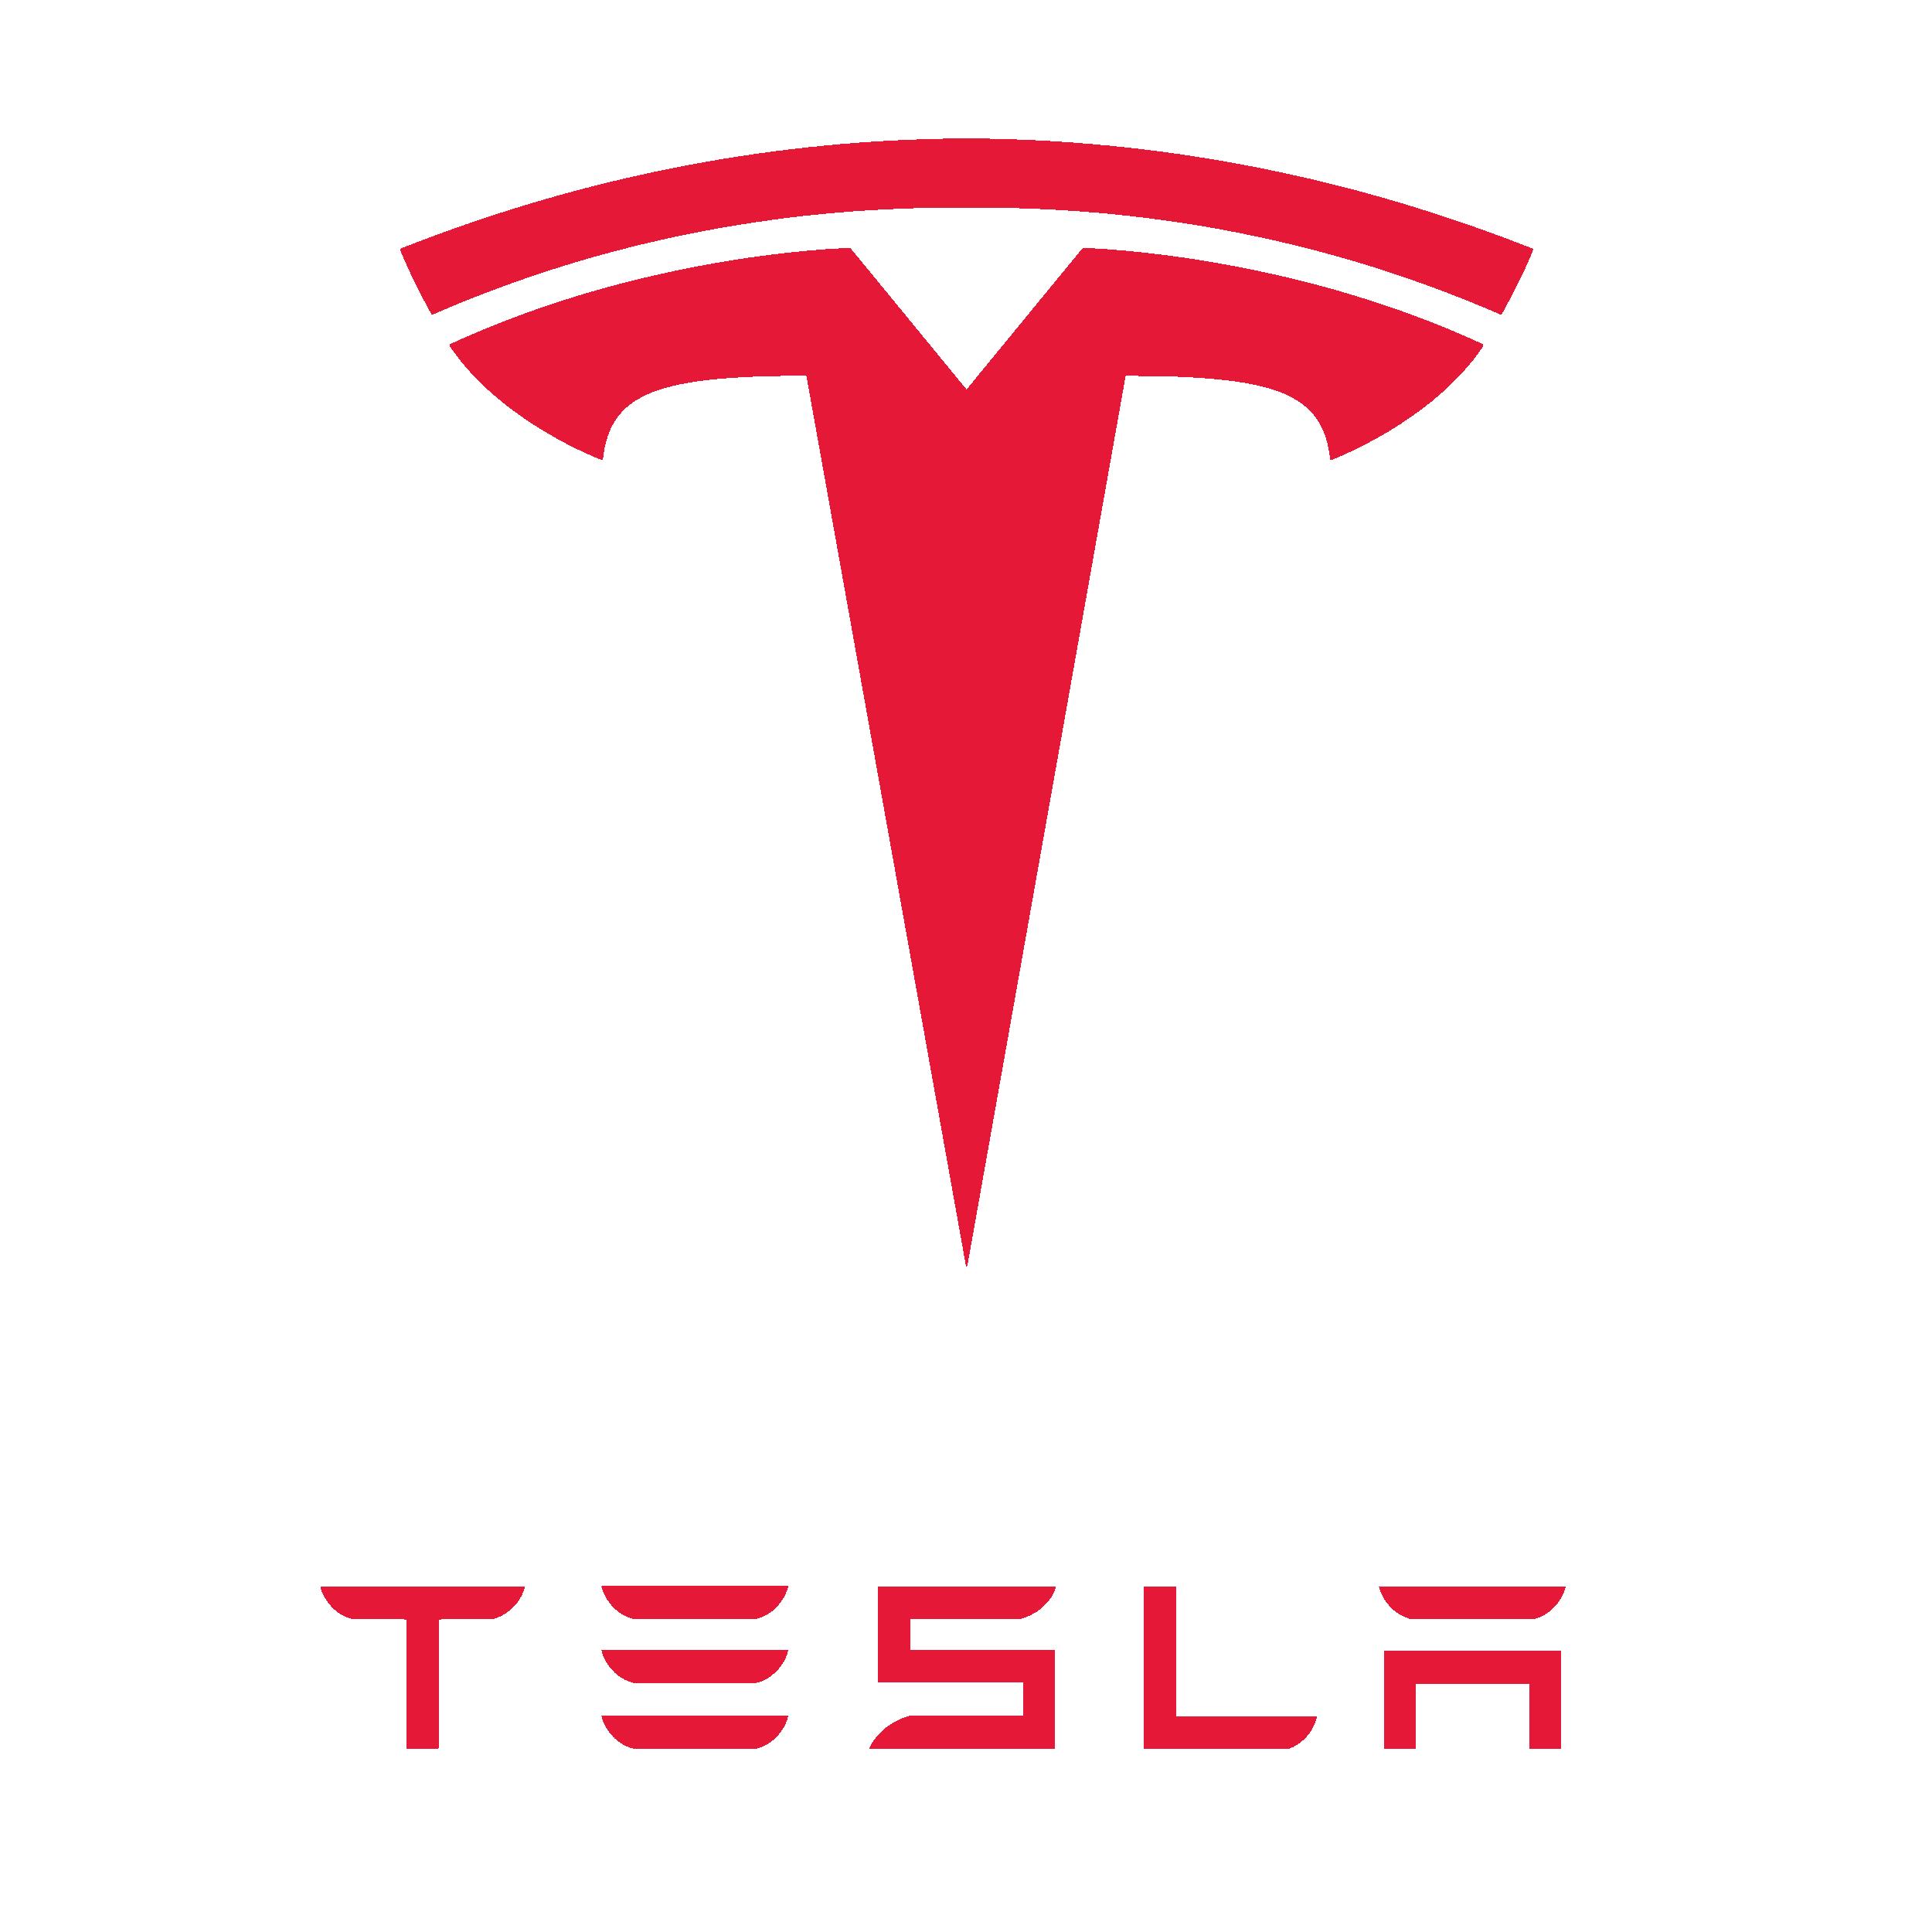 Tesla-logo-2003-2500x2500